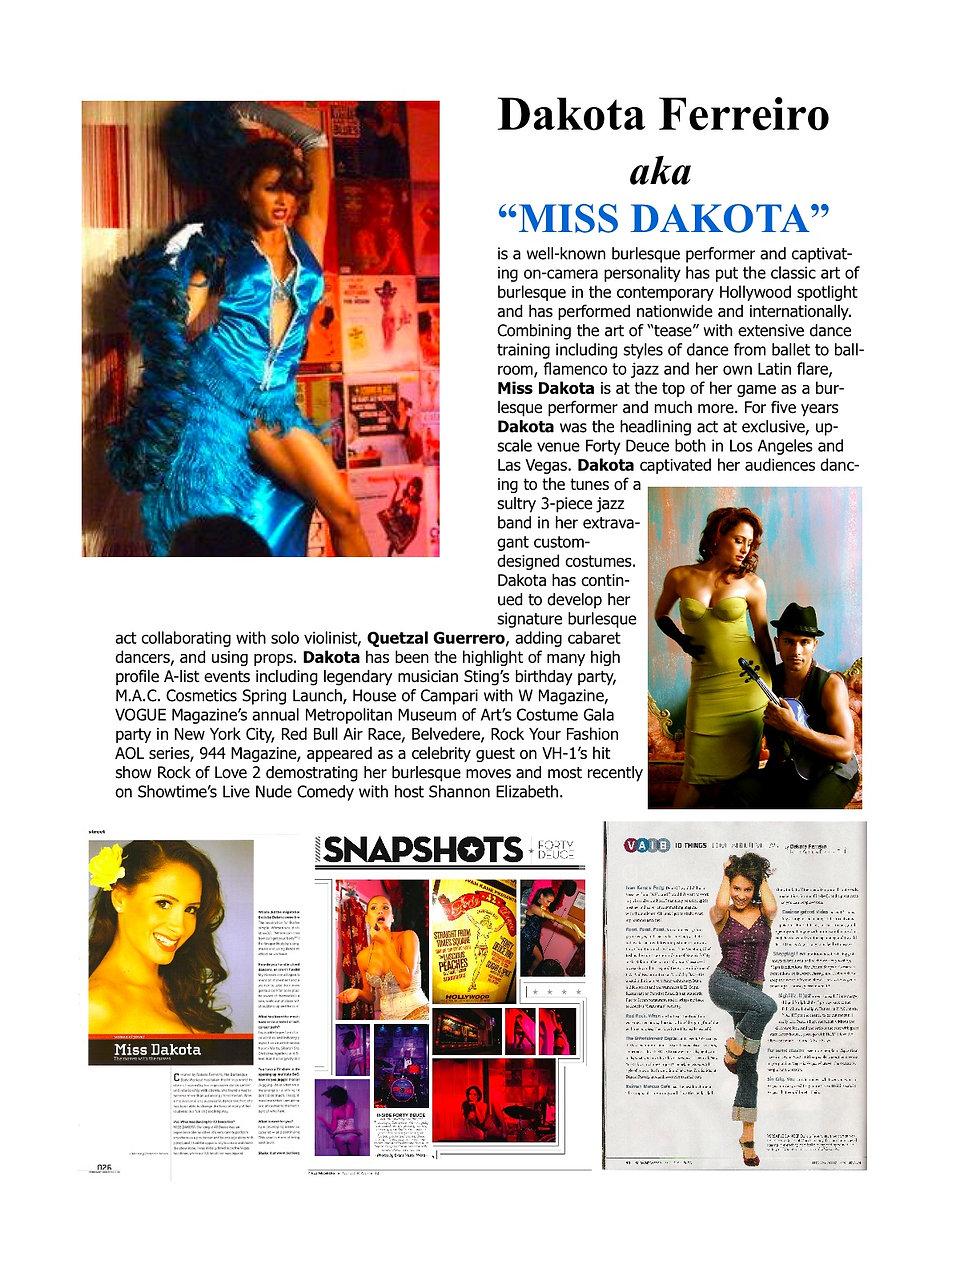 Dkta Press Kit '10-bio.jpg